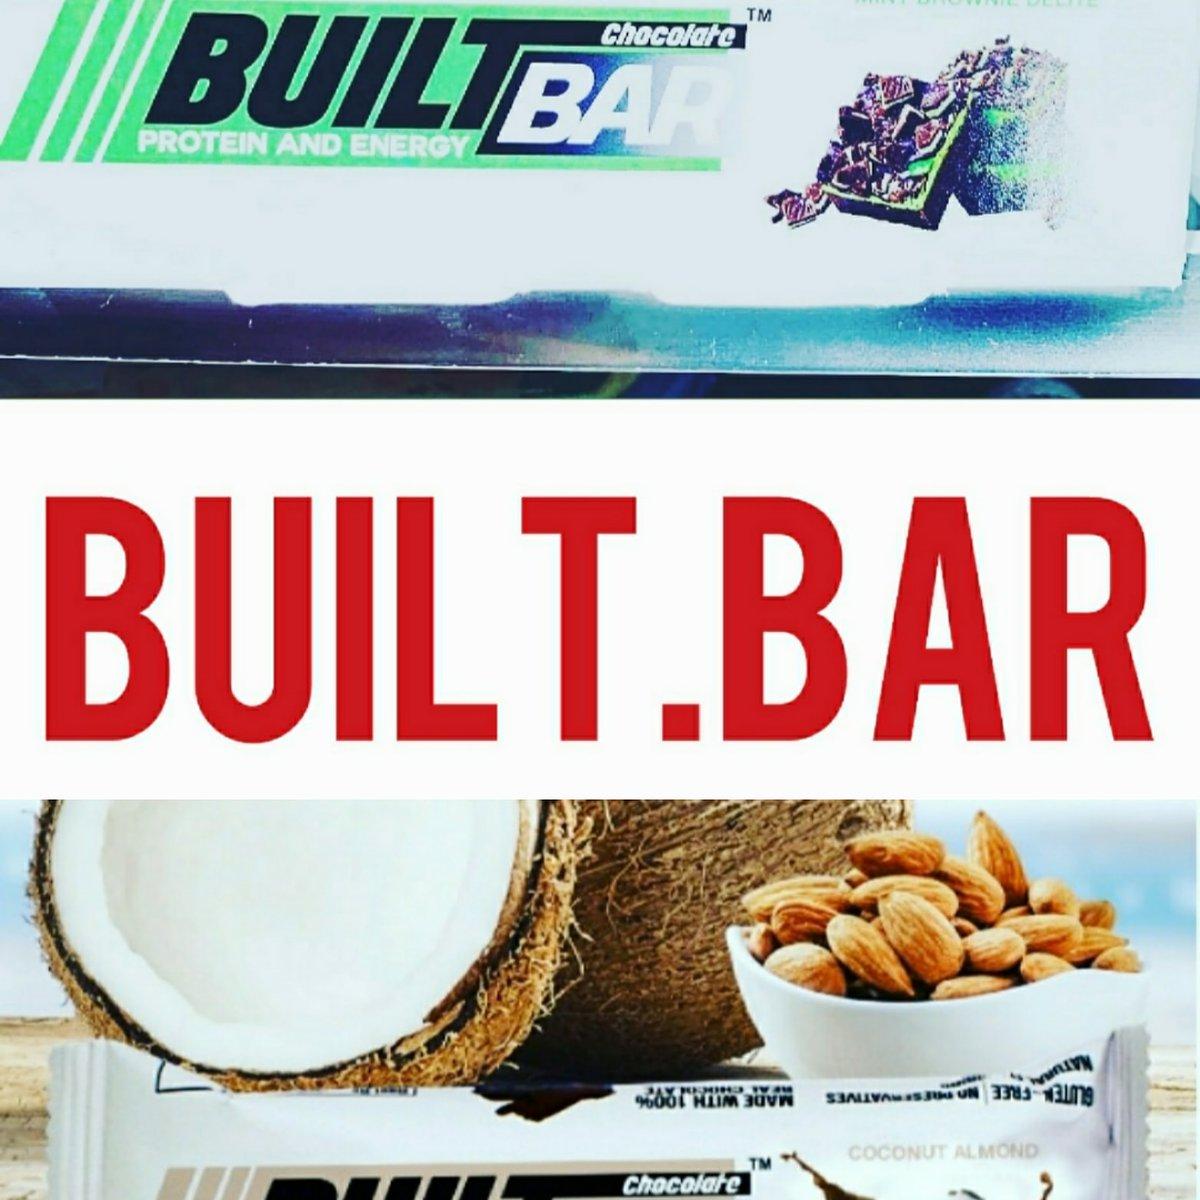 👉👉     Best Protein Bar In The World  #BuiltBar #Proteinbar #bars #protein #healthy #fit #fitness #weightloss #Diet #keto #ketodiet #workout #ketogenic #glutenfree #Workout #Proteinbars #Body #gym #health #Bike  #cycling #Utah  #FatLoss #Vegan #vegetarian